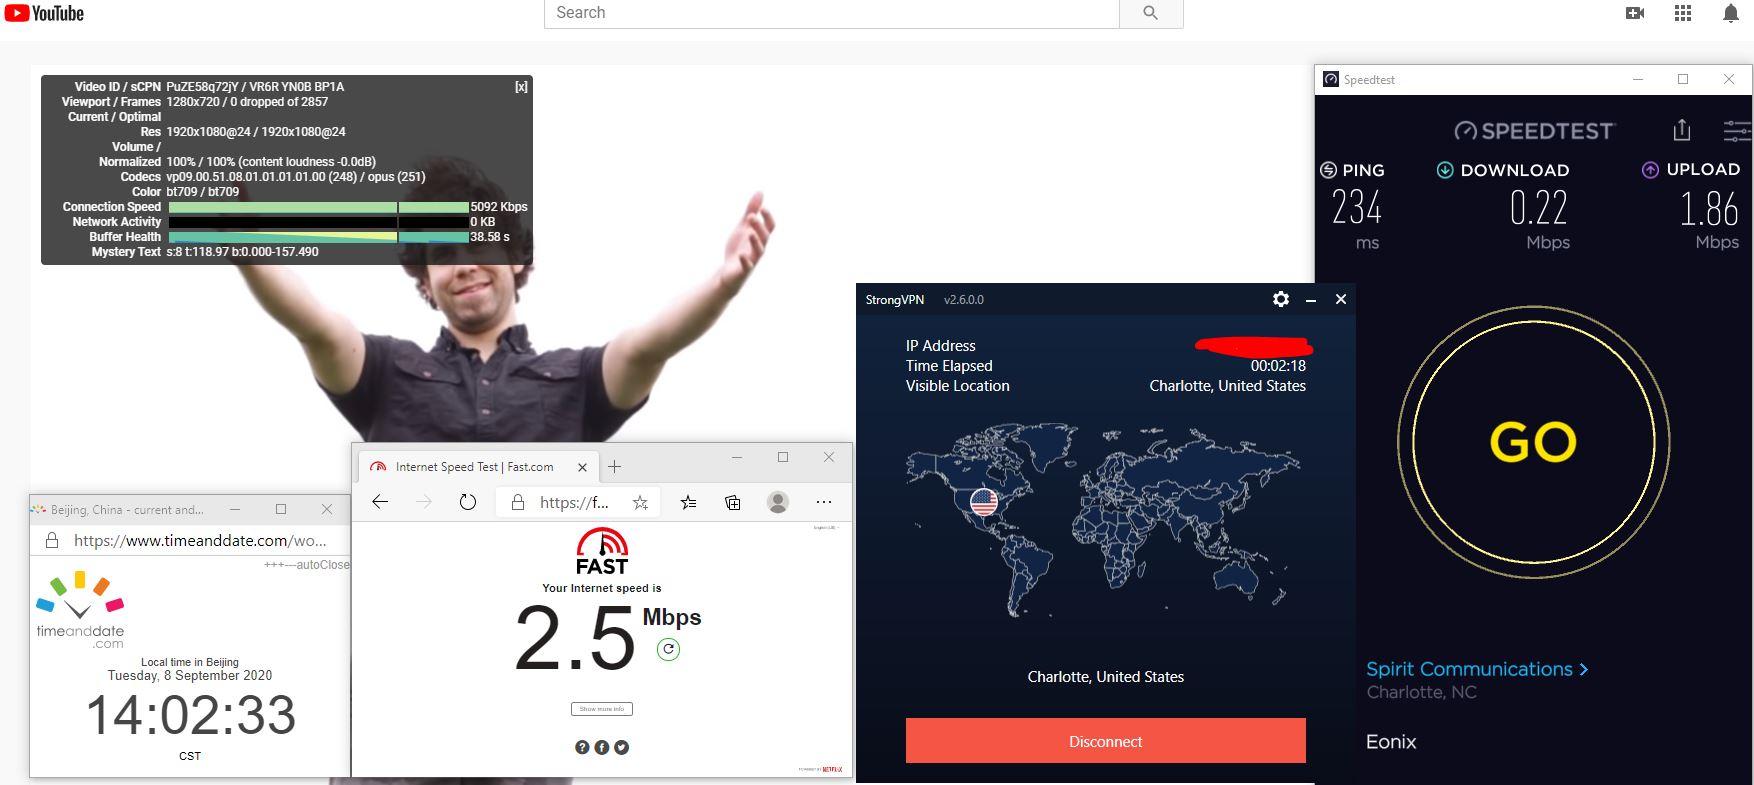 Windows10 StrongVPN USA - Charlotte 中国VPN 翻墙 科学上网 翻墙速度测试 - 20200908